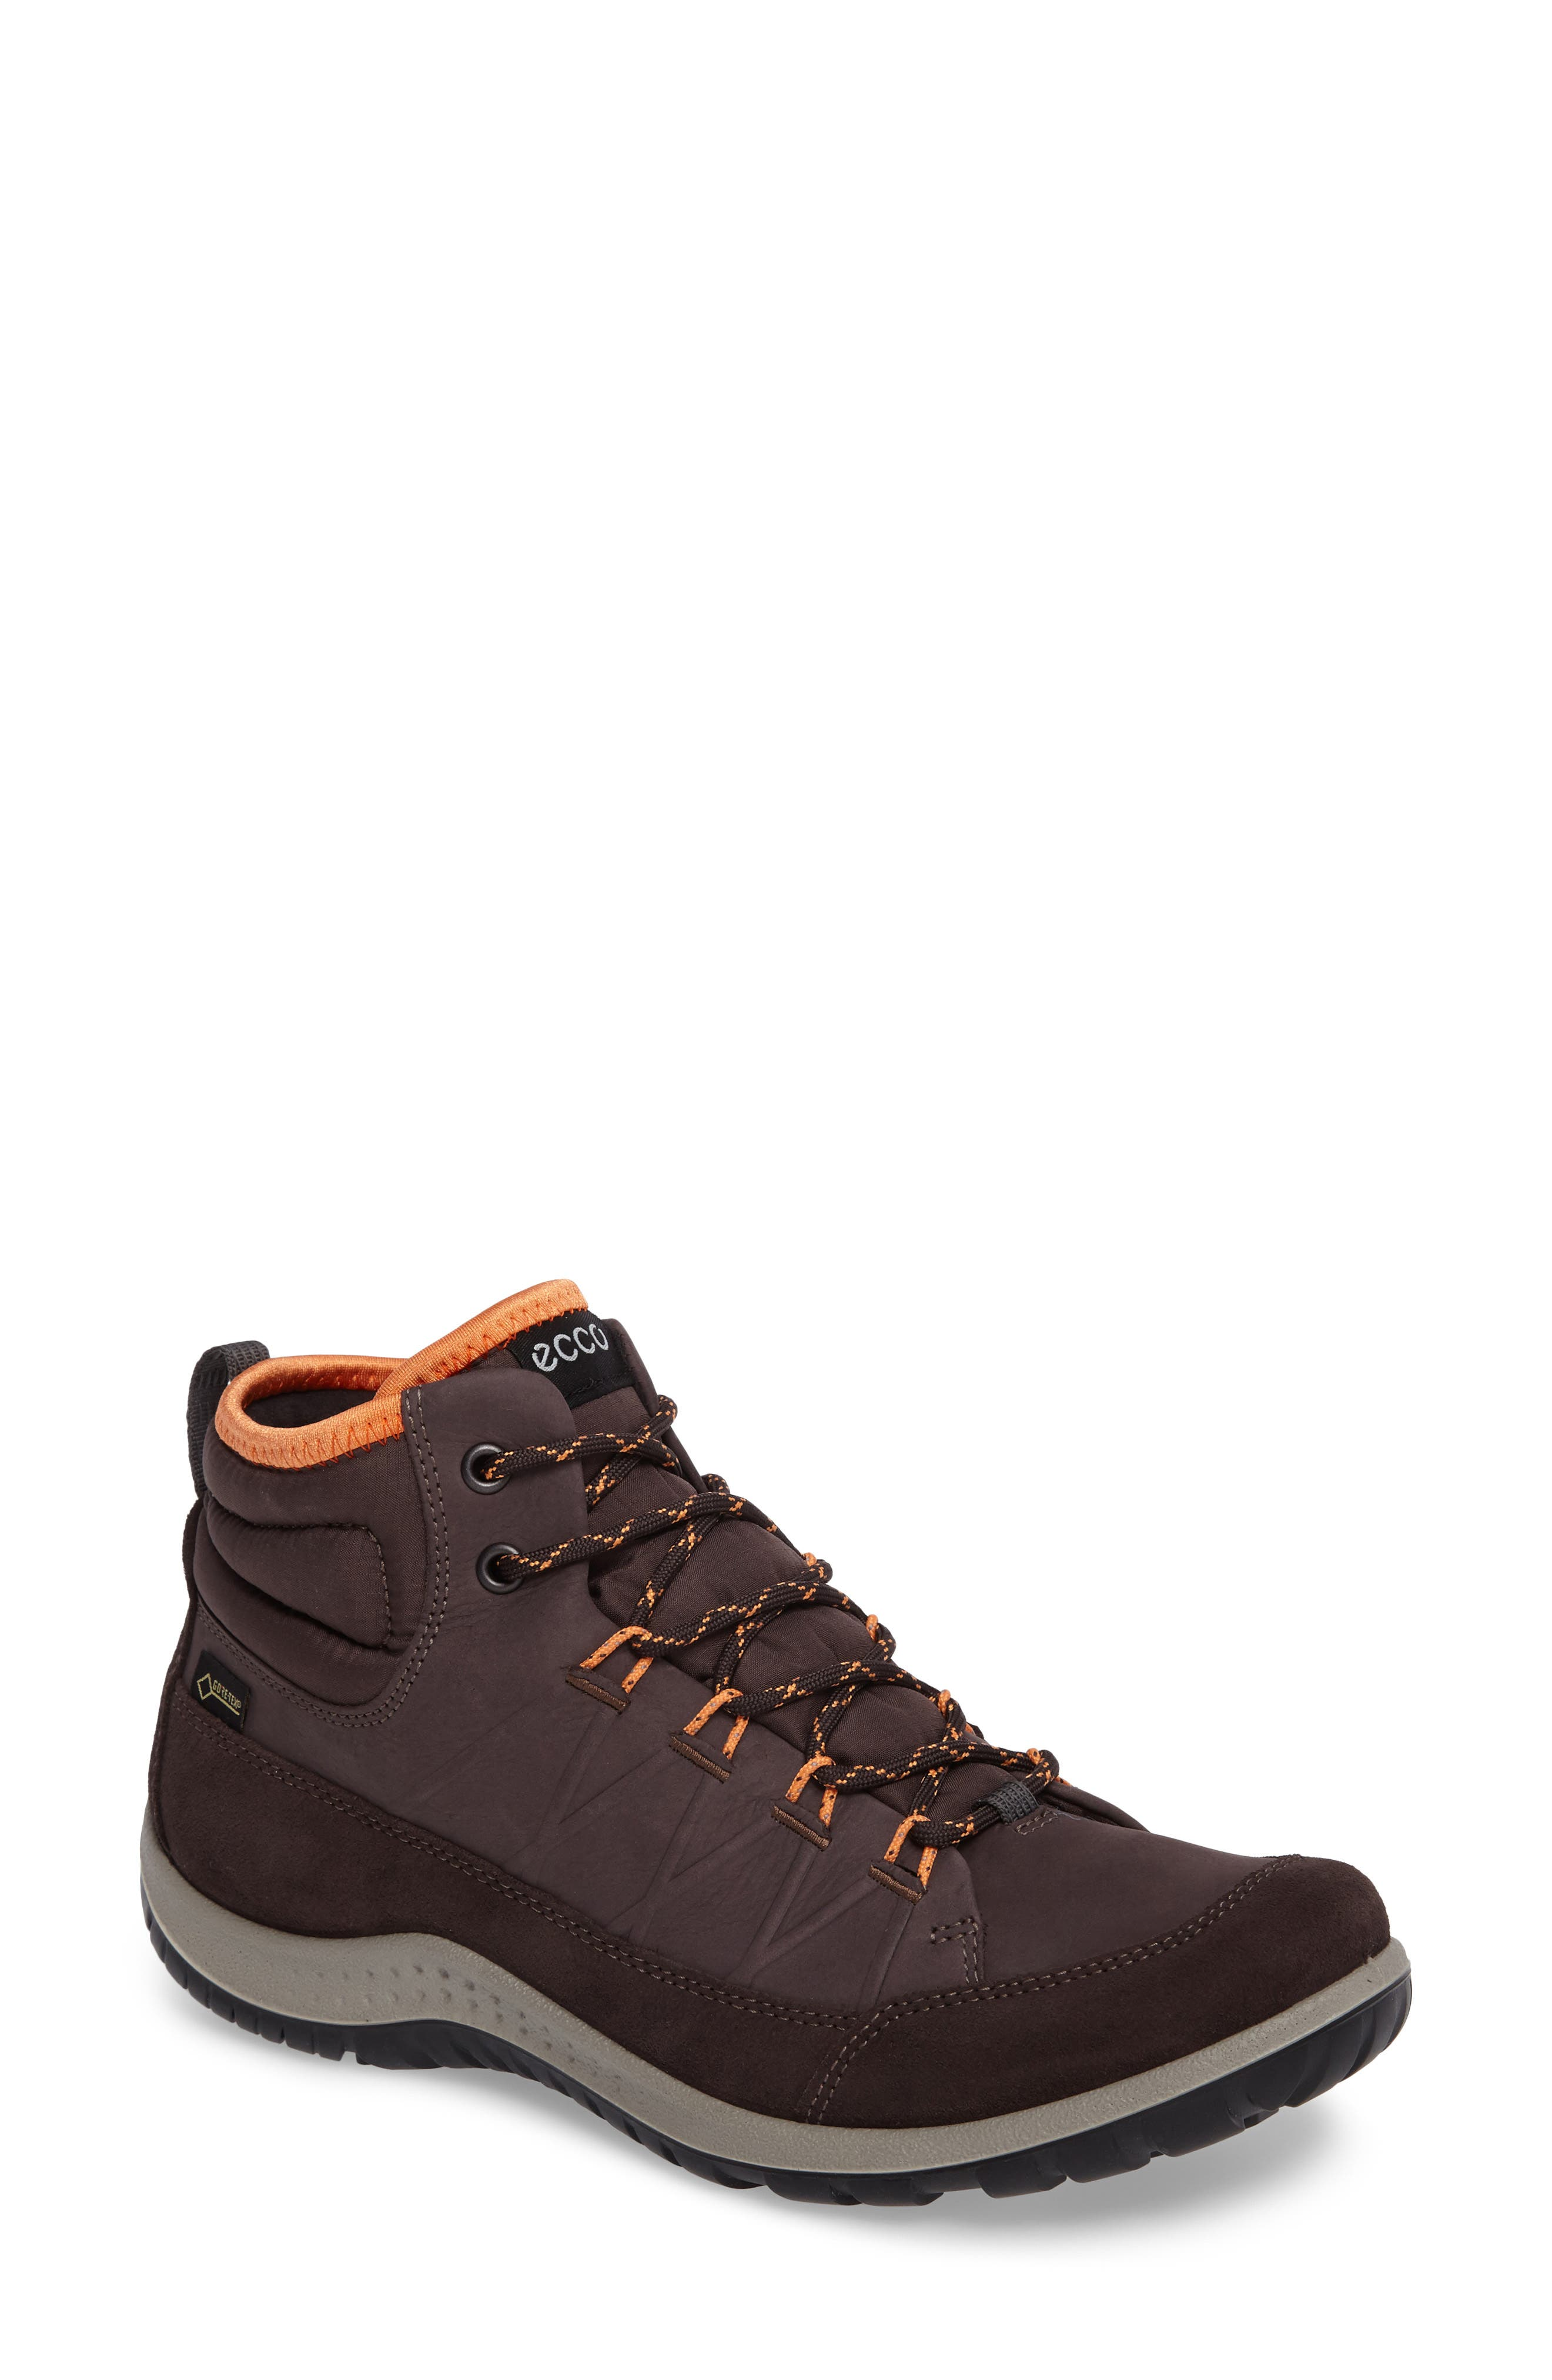 Alternate Image 1 Selected - ECCO 'Aspina GTX' Waterproof High Top Sneaker (Women)